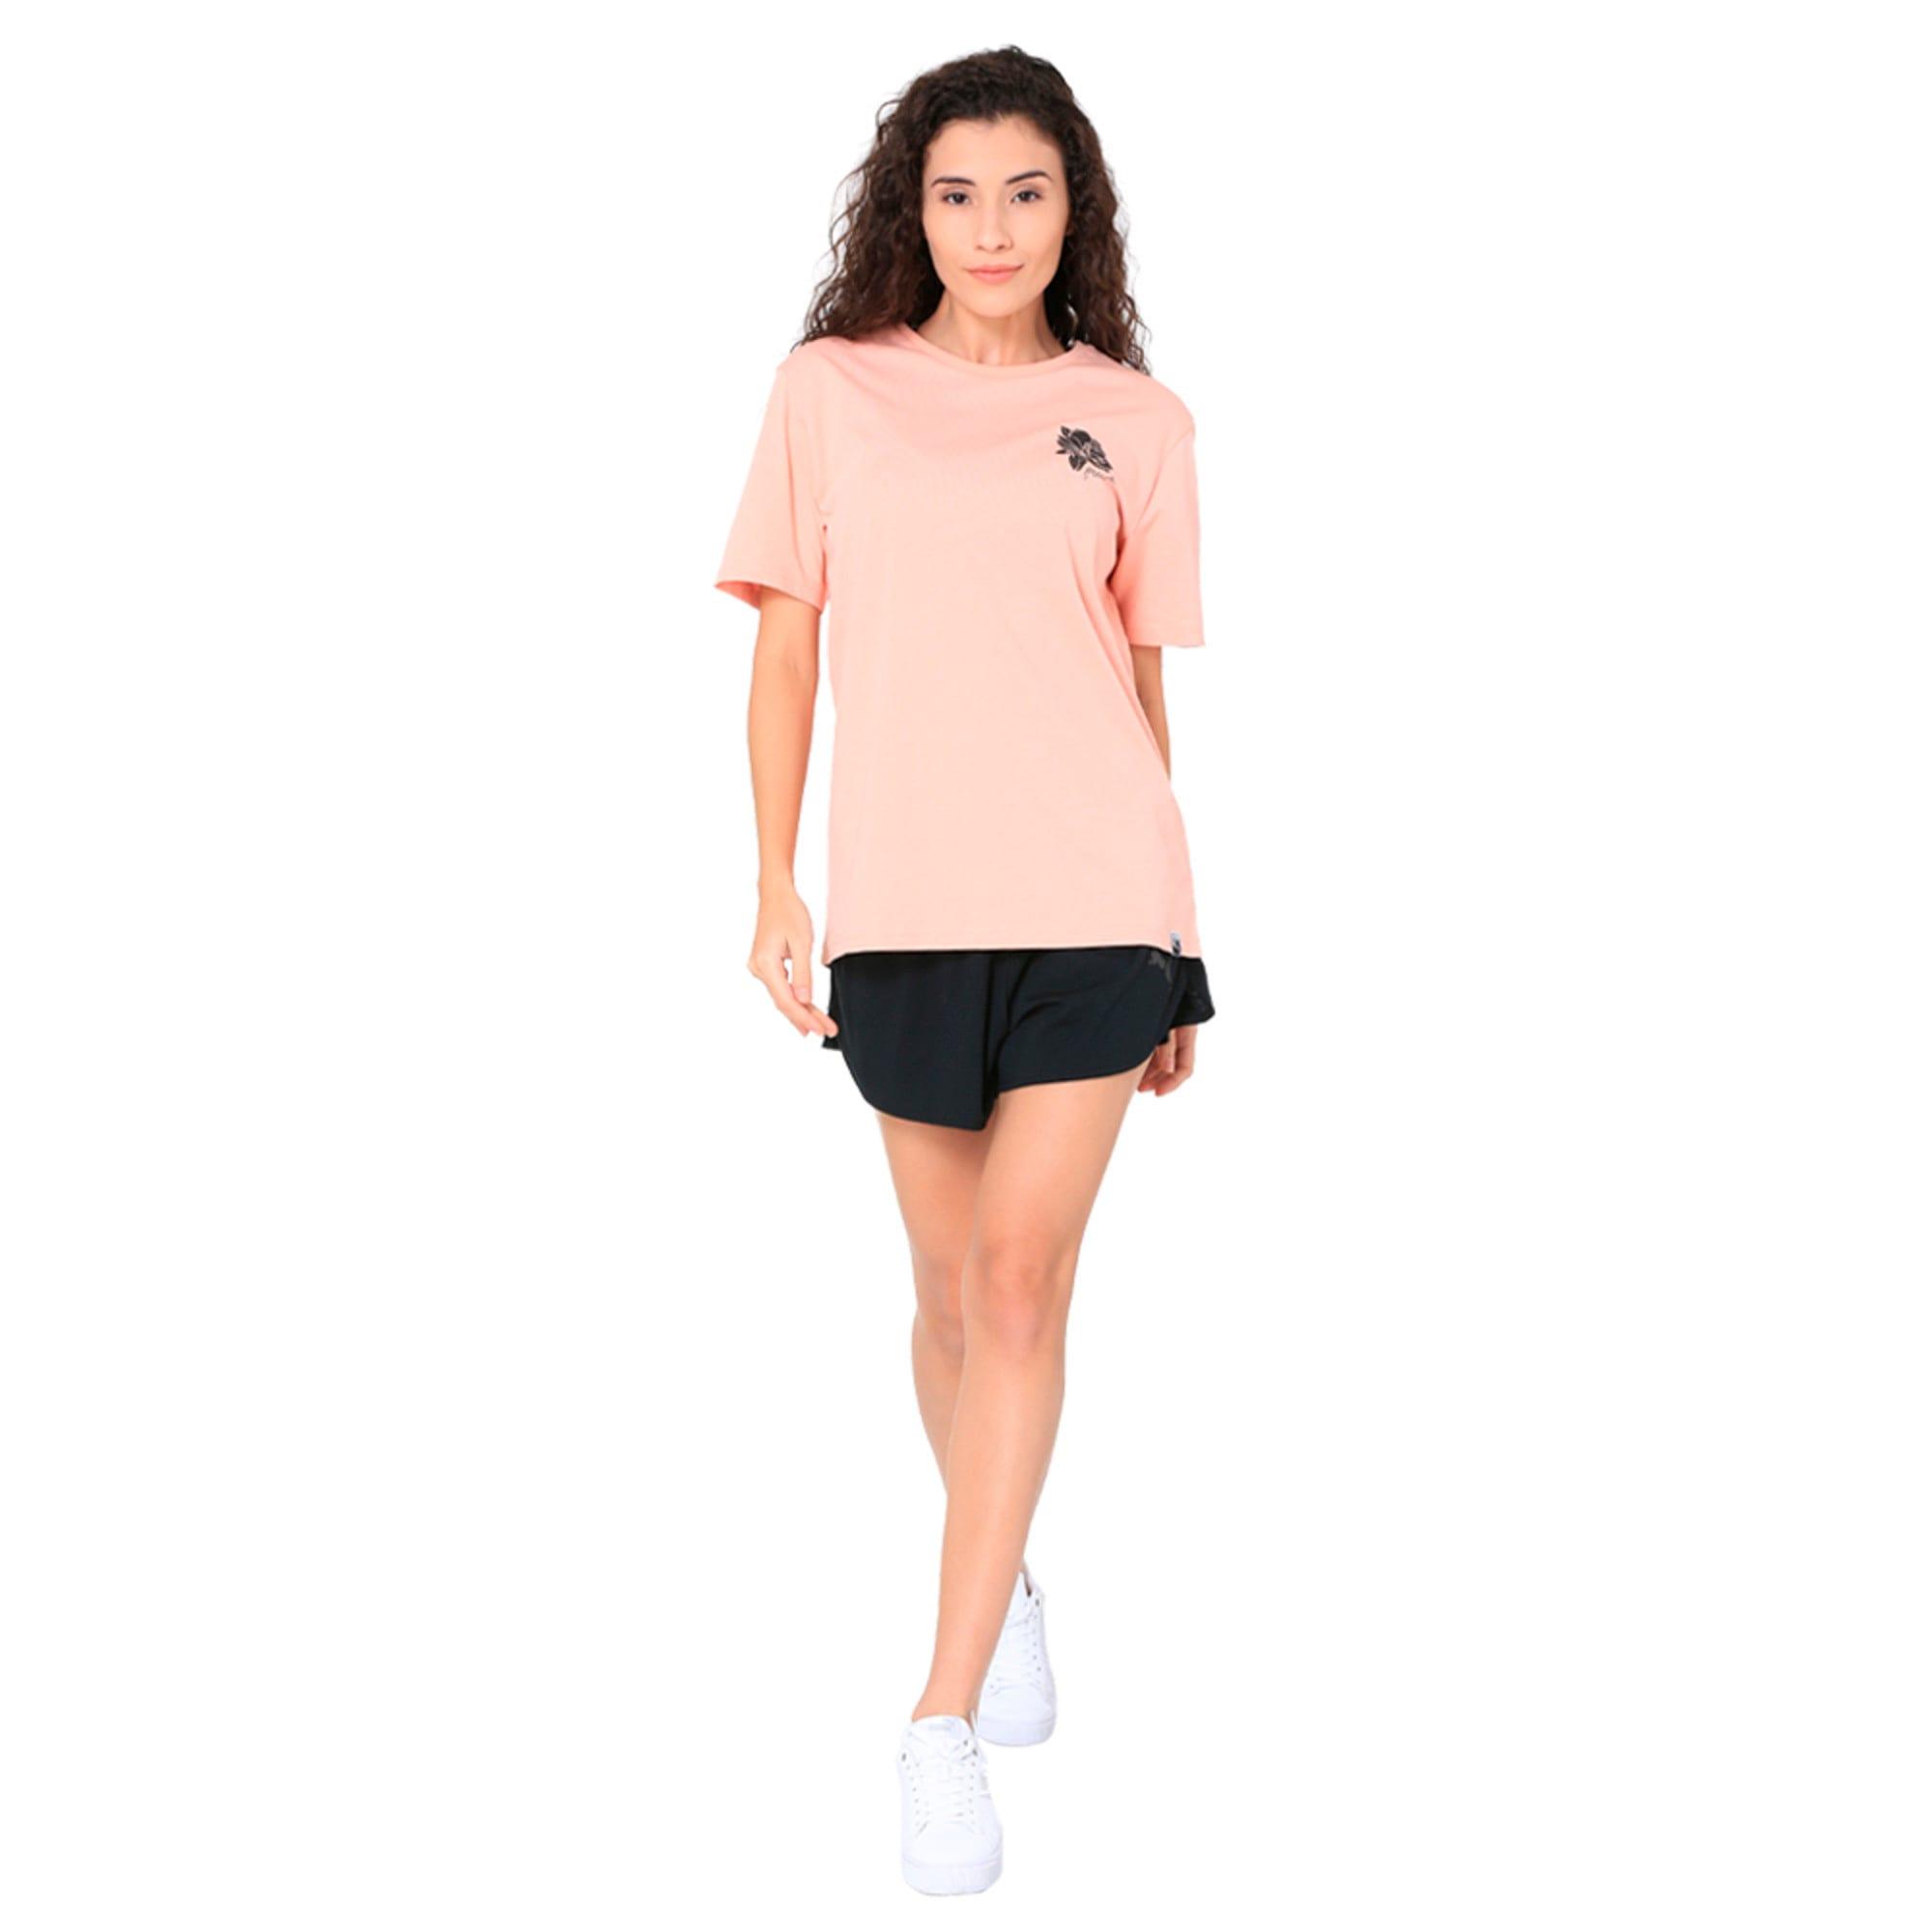 Thumbnail 6 of Women's Graphic T-shirt, Peach Beige, medium-IND